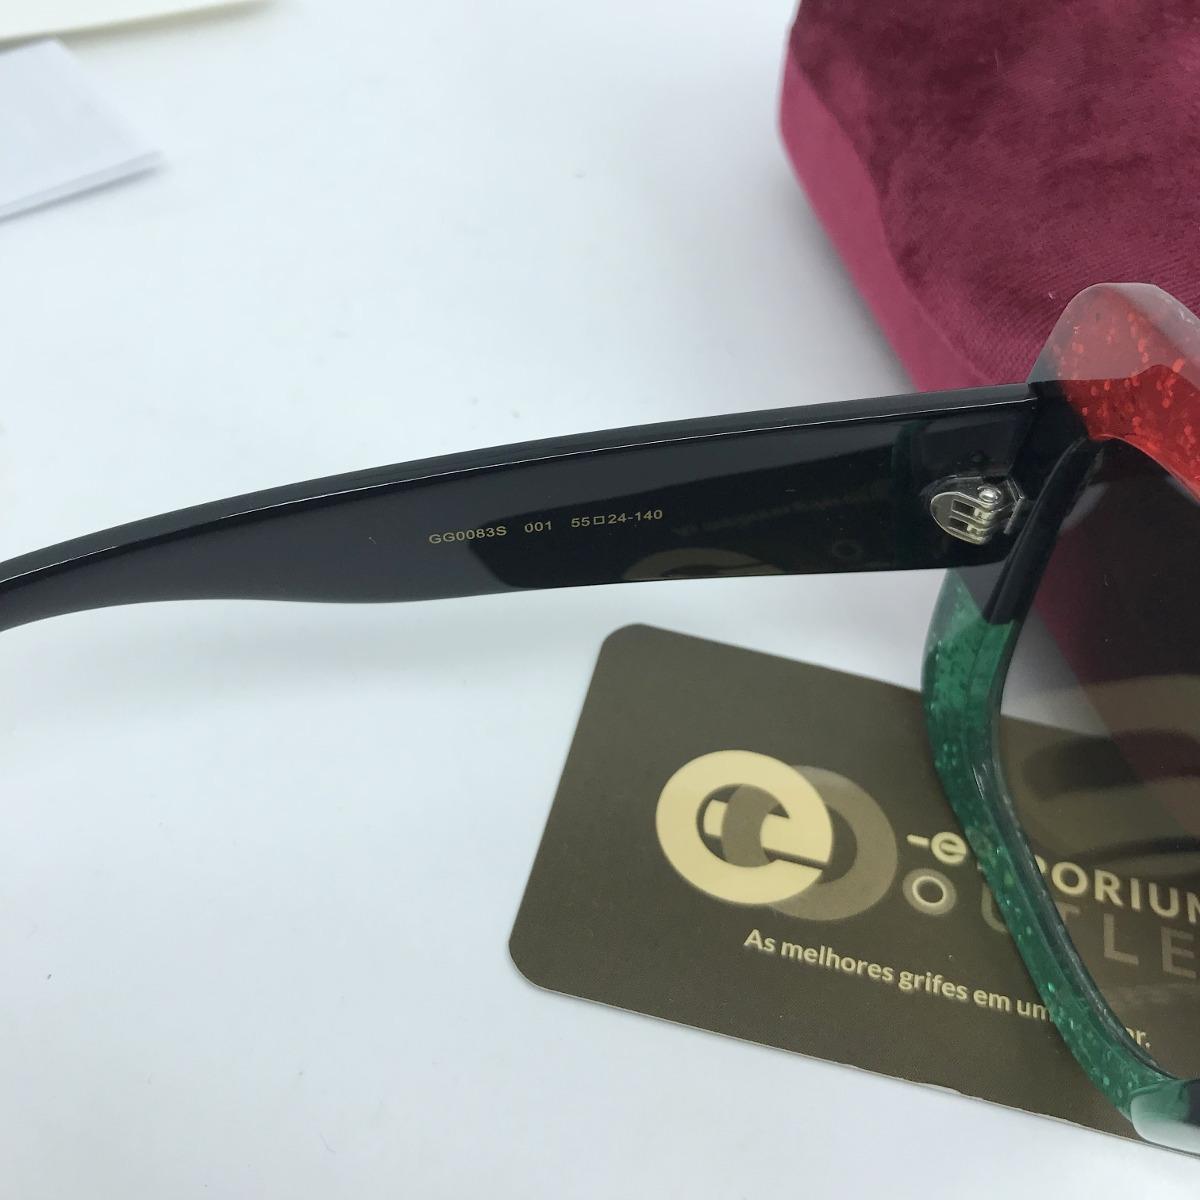 3bef8bc1d065a oculos gucci original gg0083s oportunidade. Carregando zoom.